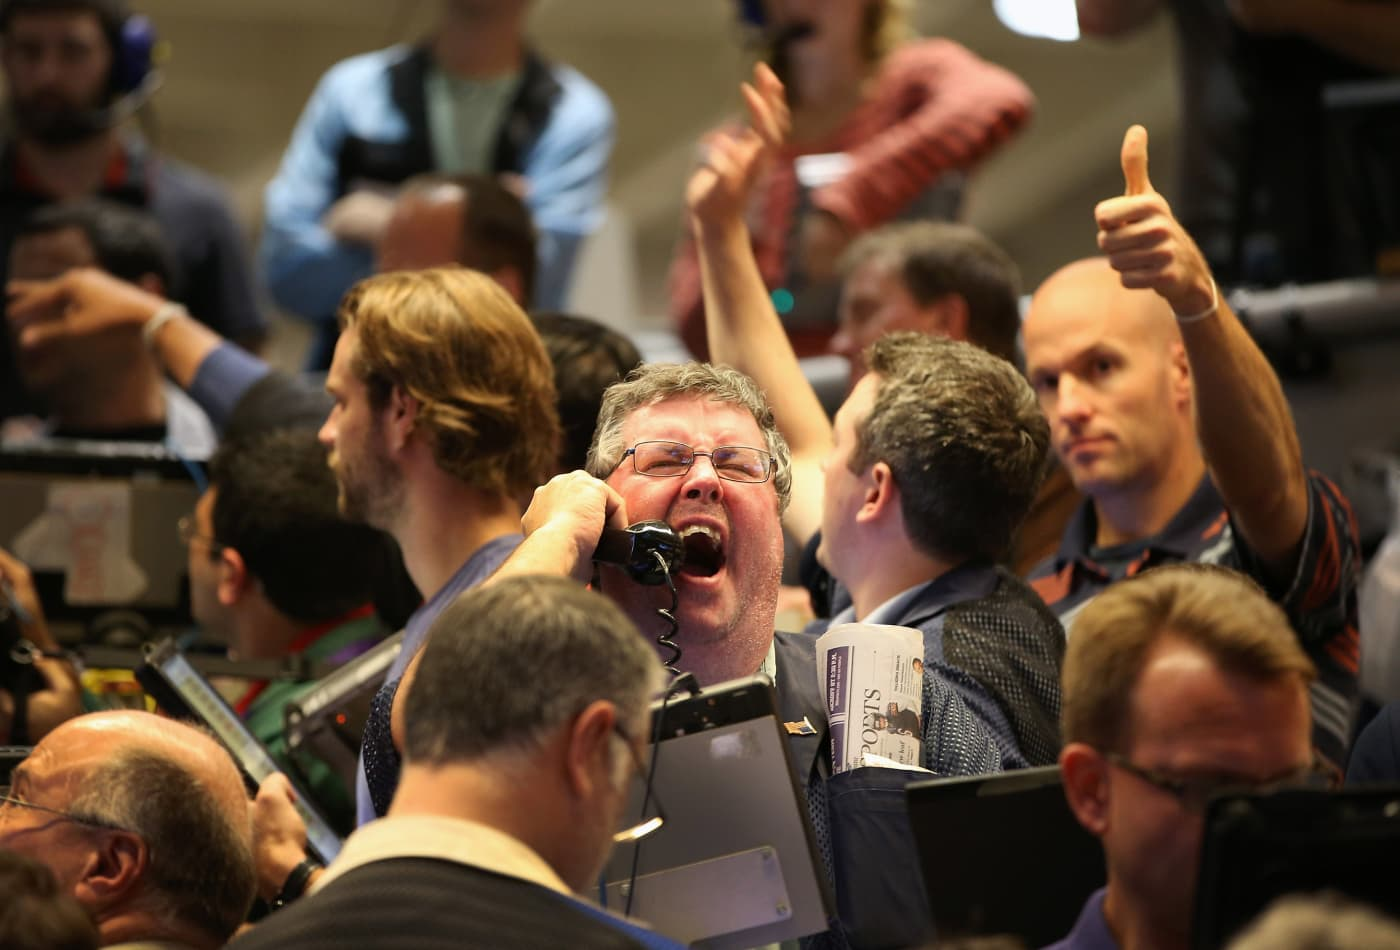 JP Morgan leads bank earnings with billions in bond trading revenue